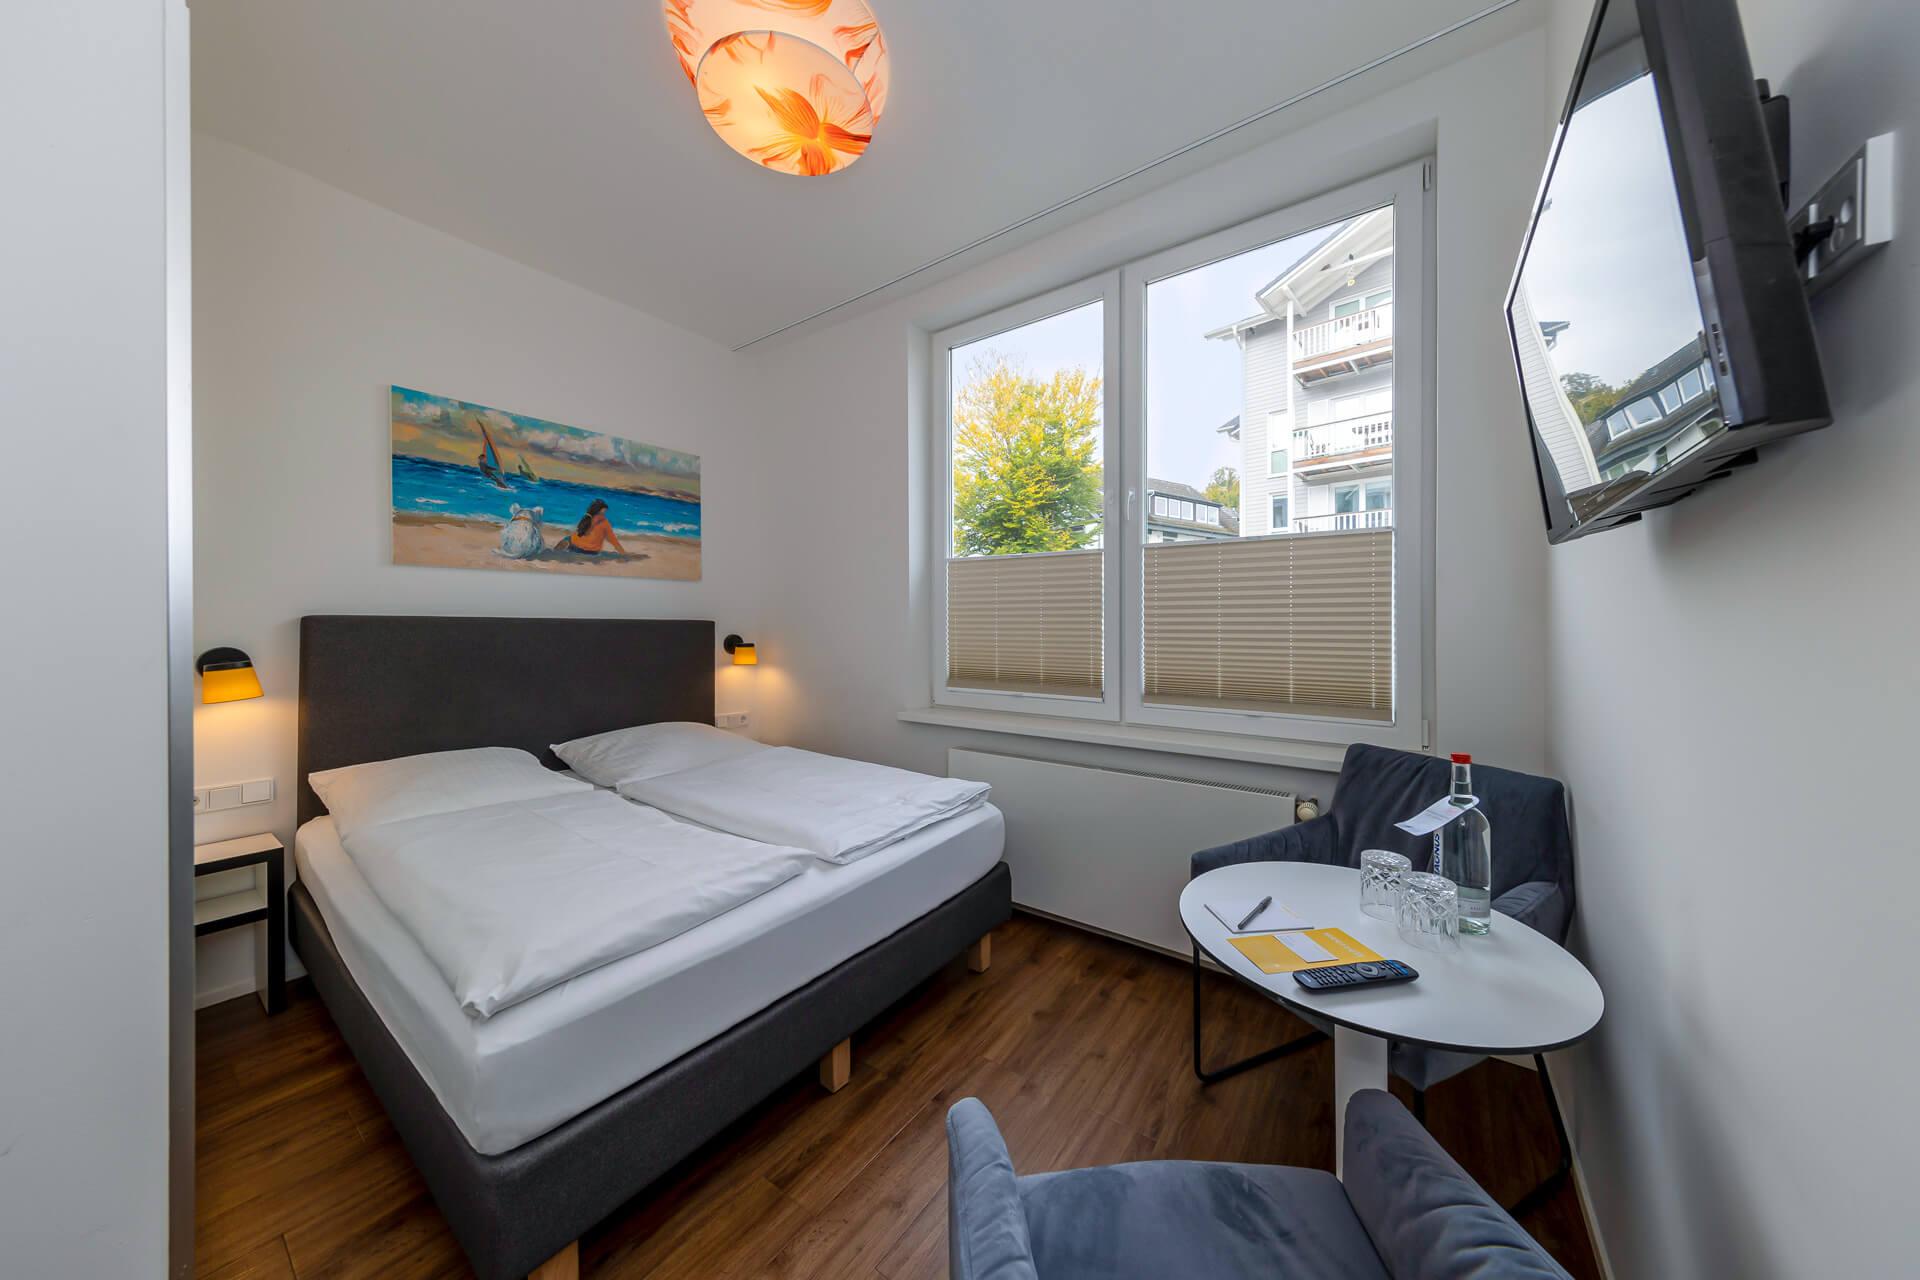 Hotel-Meerzeit-Economy